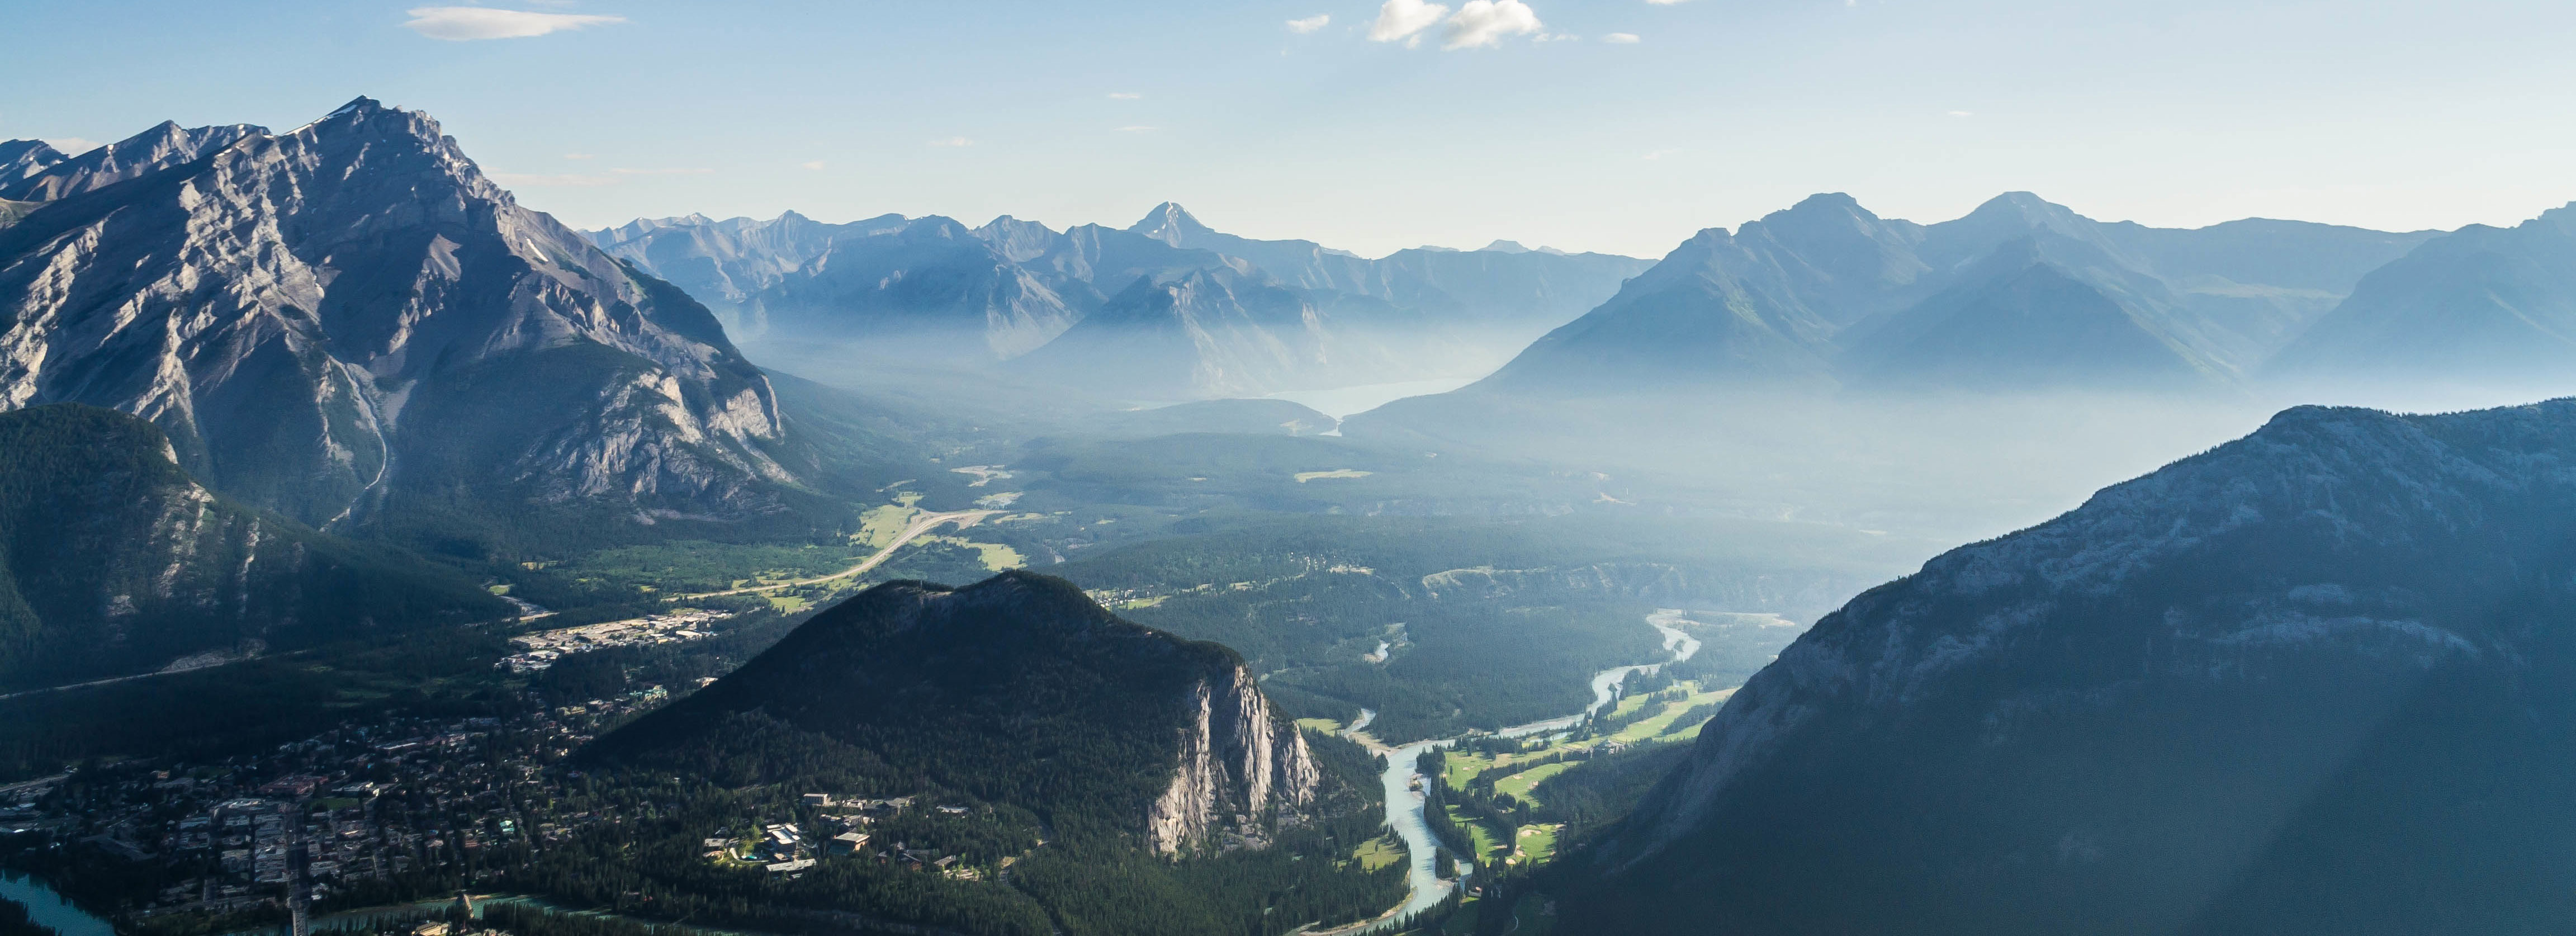 Banff, Canada - Brandon Lam